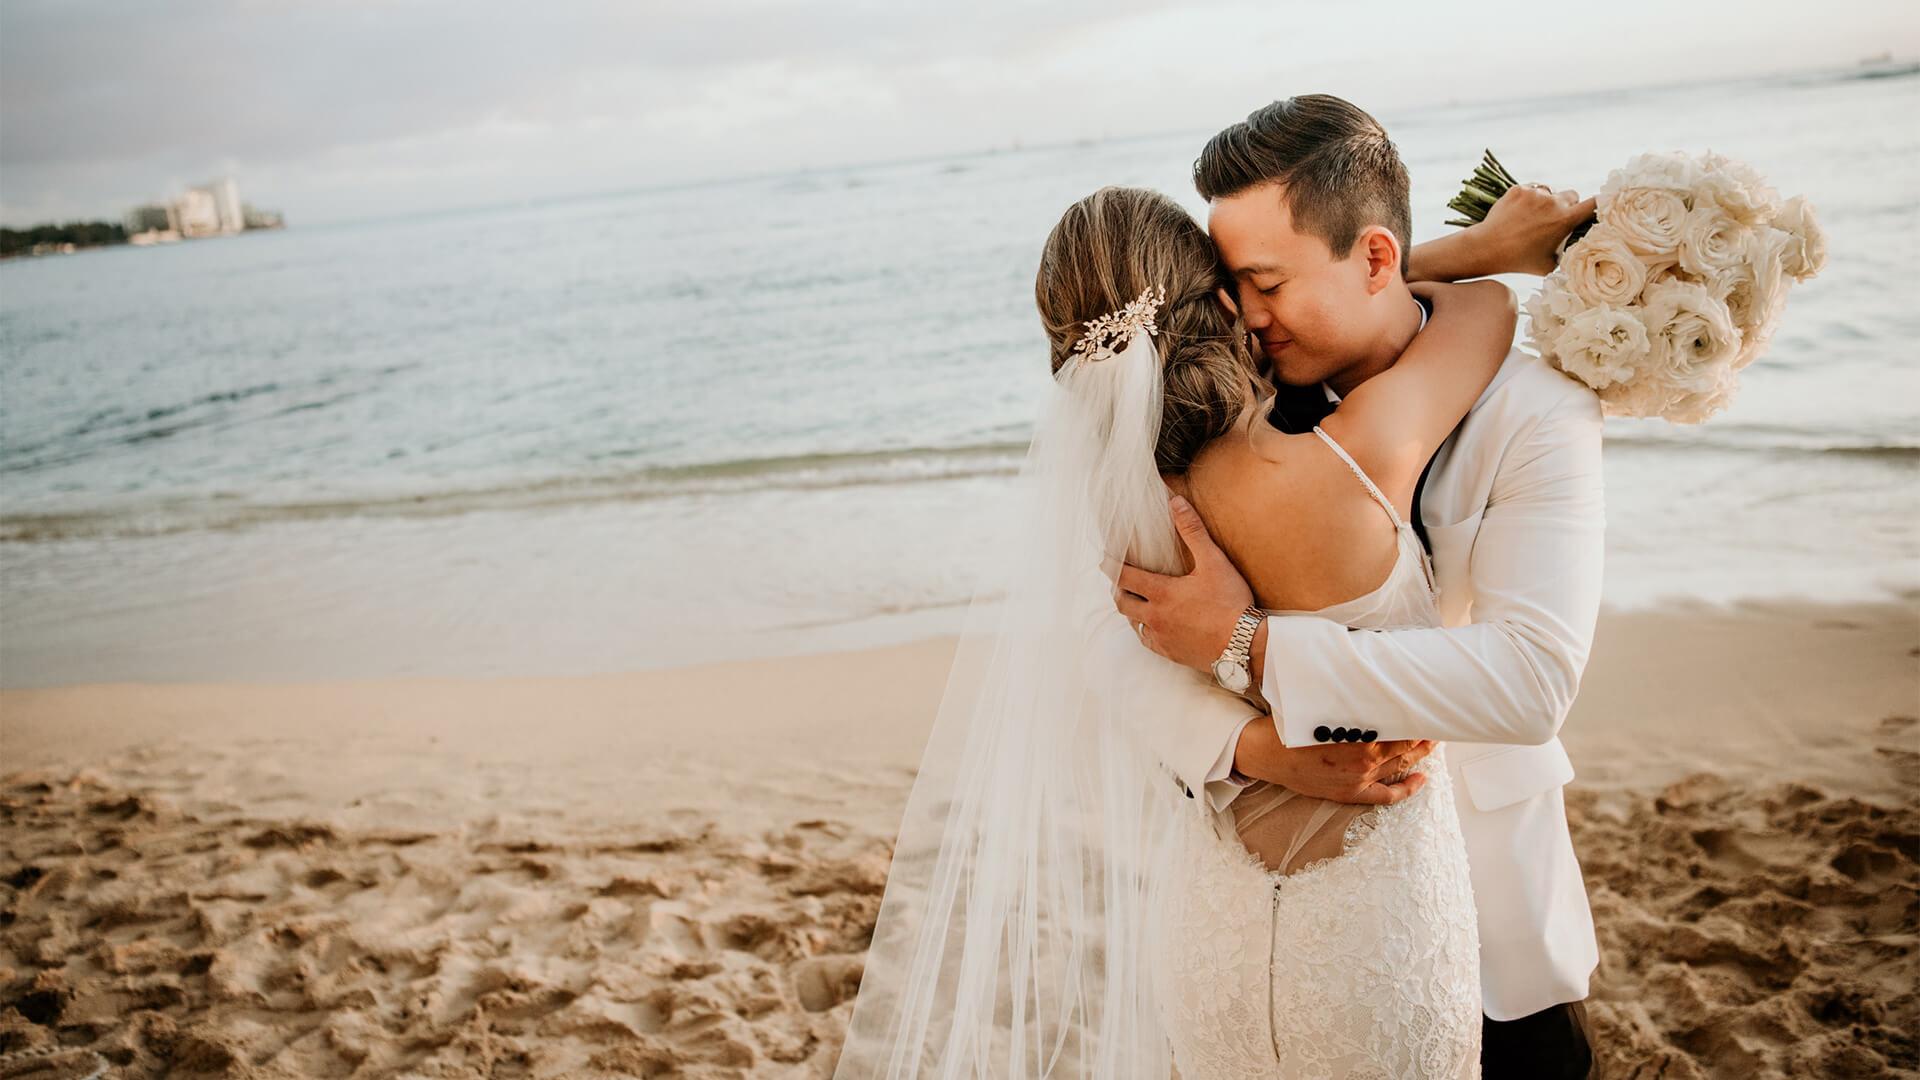 Wedding couple embrace on the beach